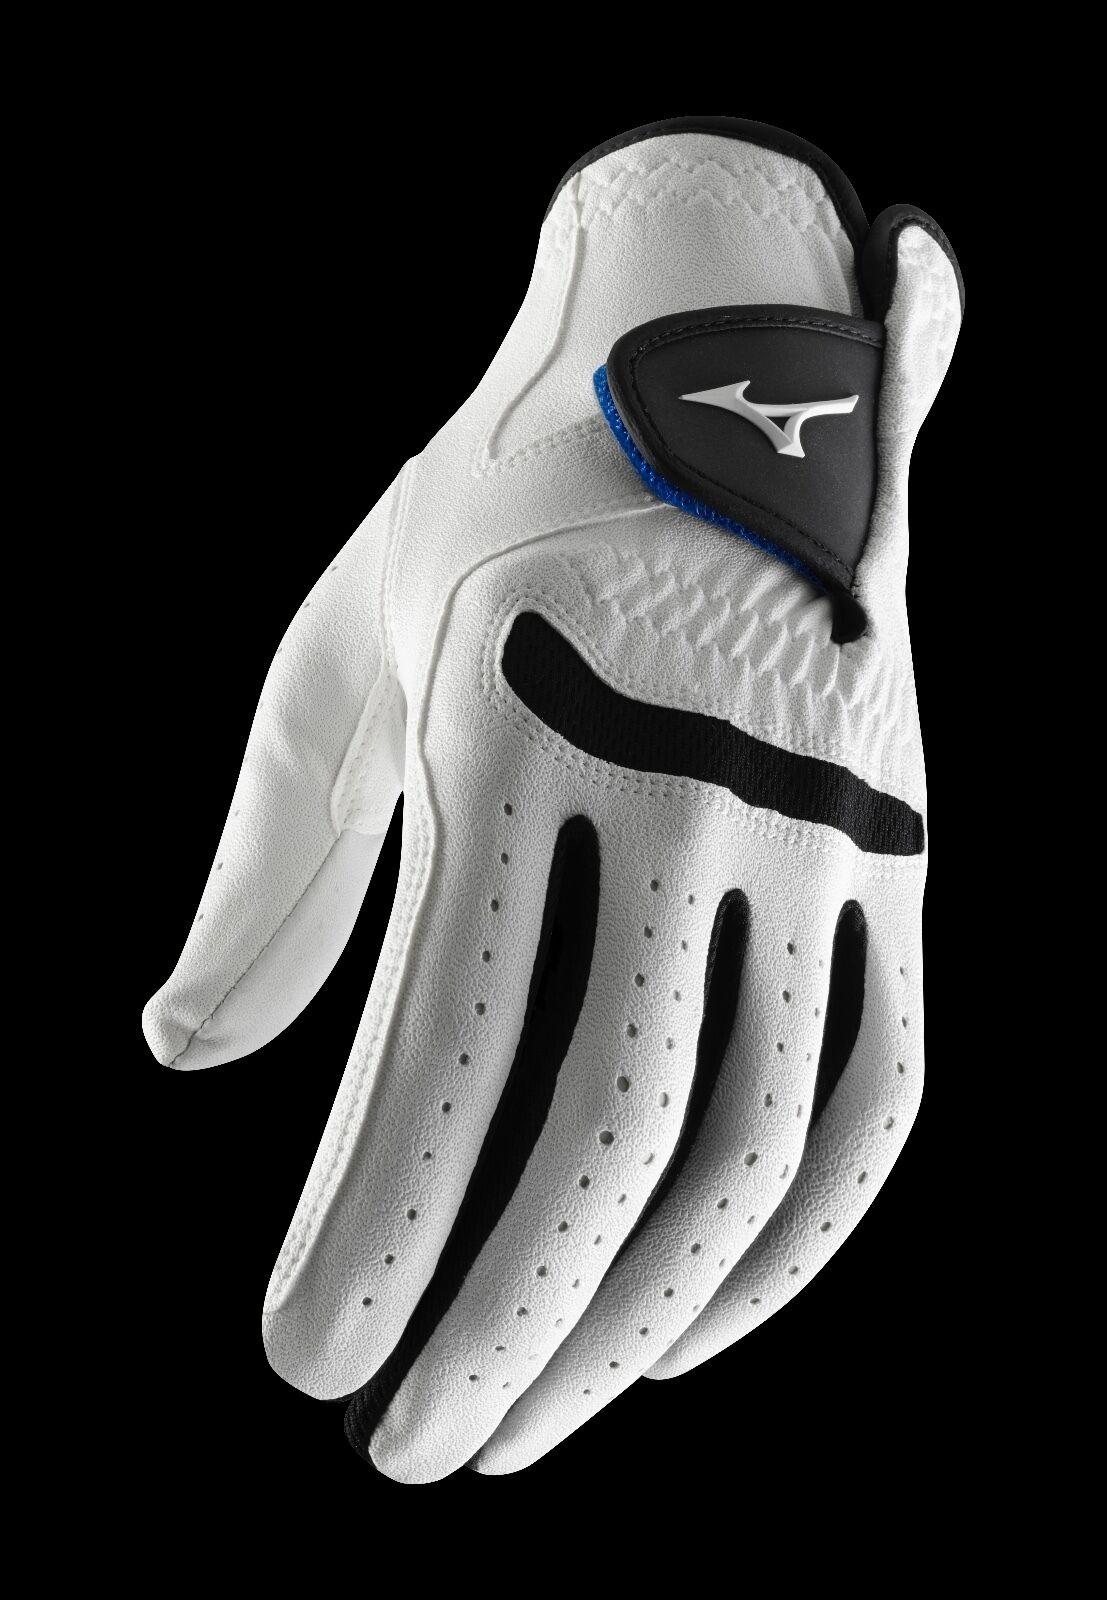 Mizuno Golfhandschuhe COMP Herren Golf Handschuh NEU NUR 9,95 € !